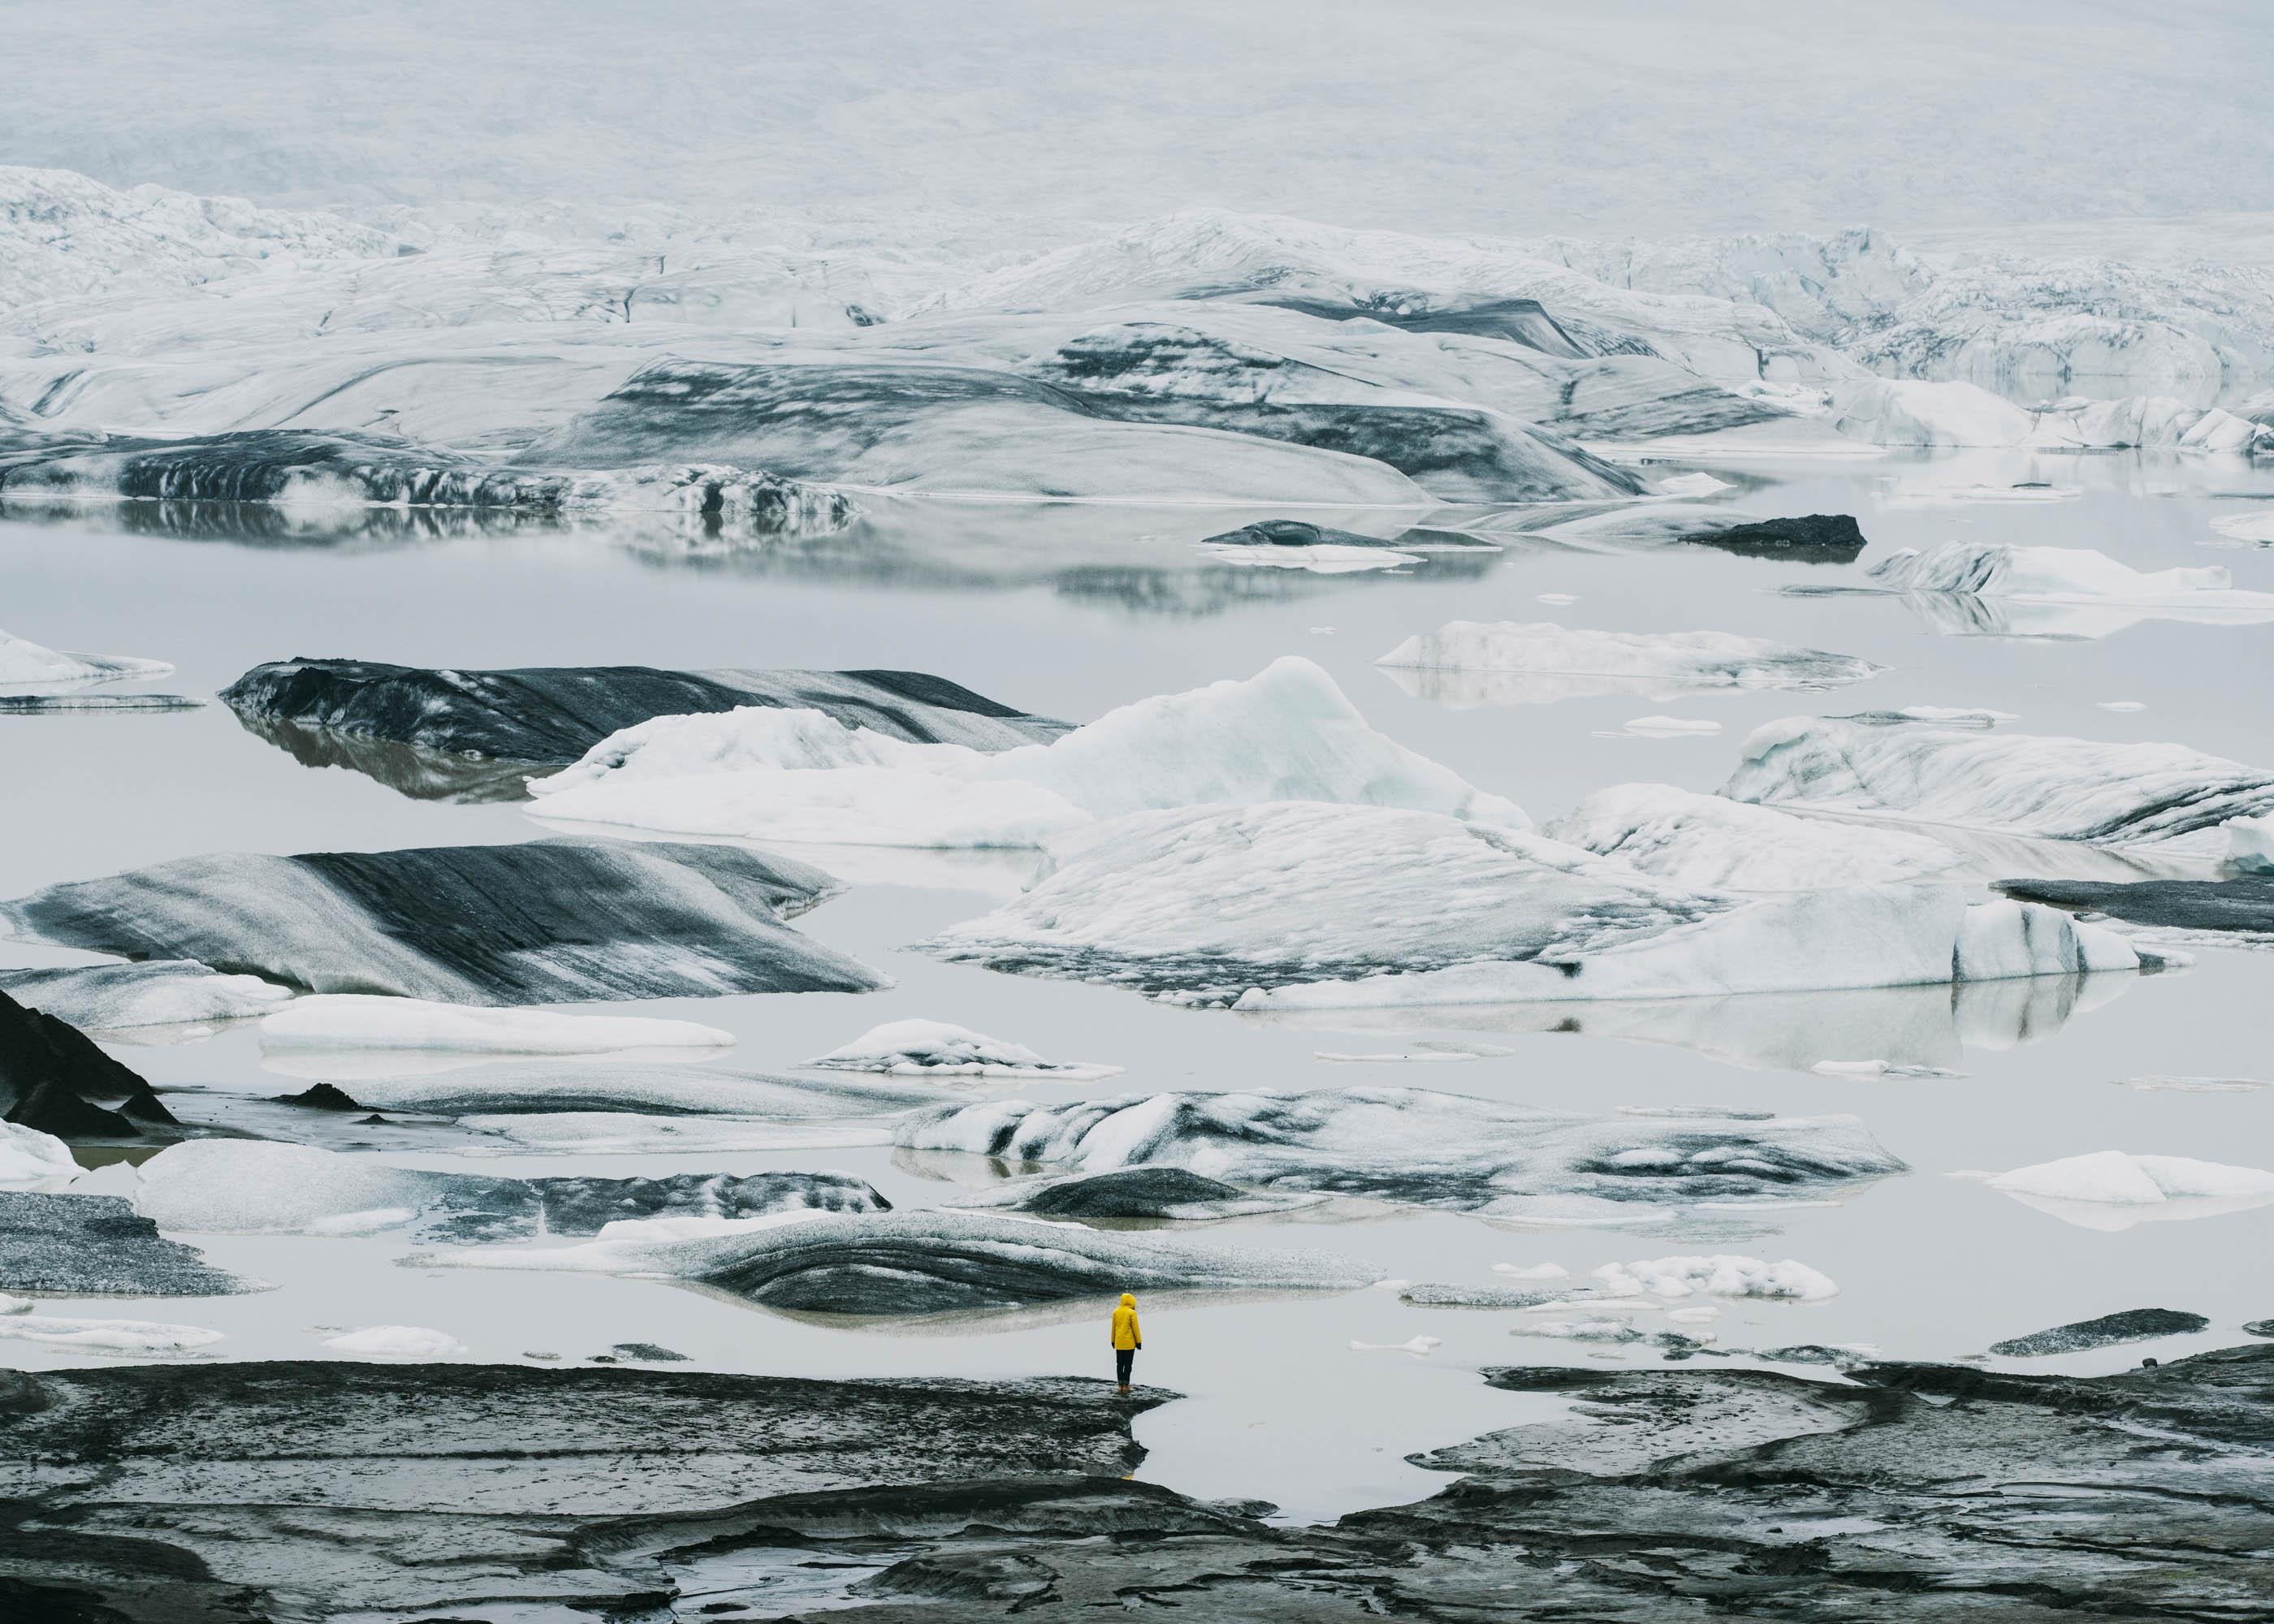 #personal #iceland #hoffellsjokull #glacier #caterina #landscapes